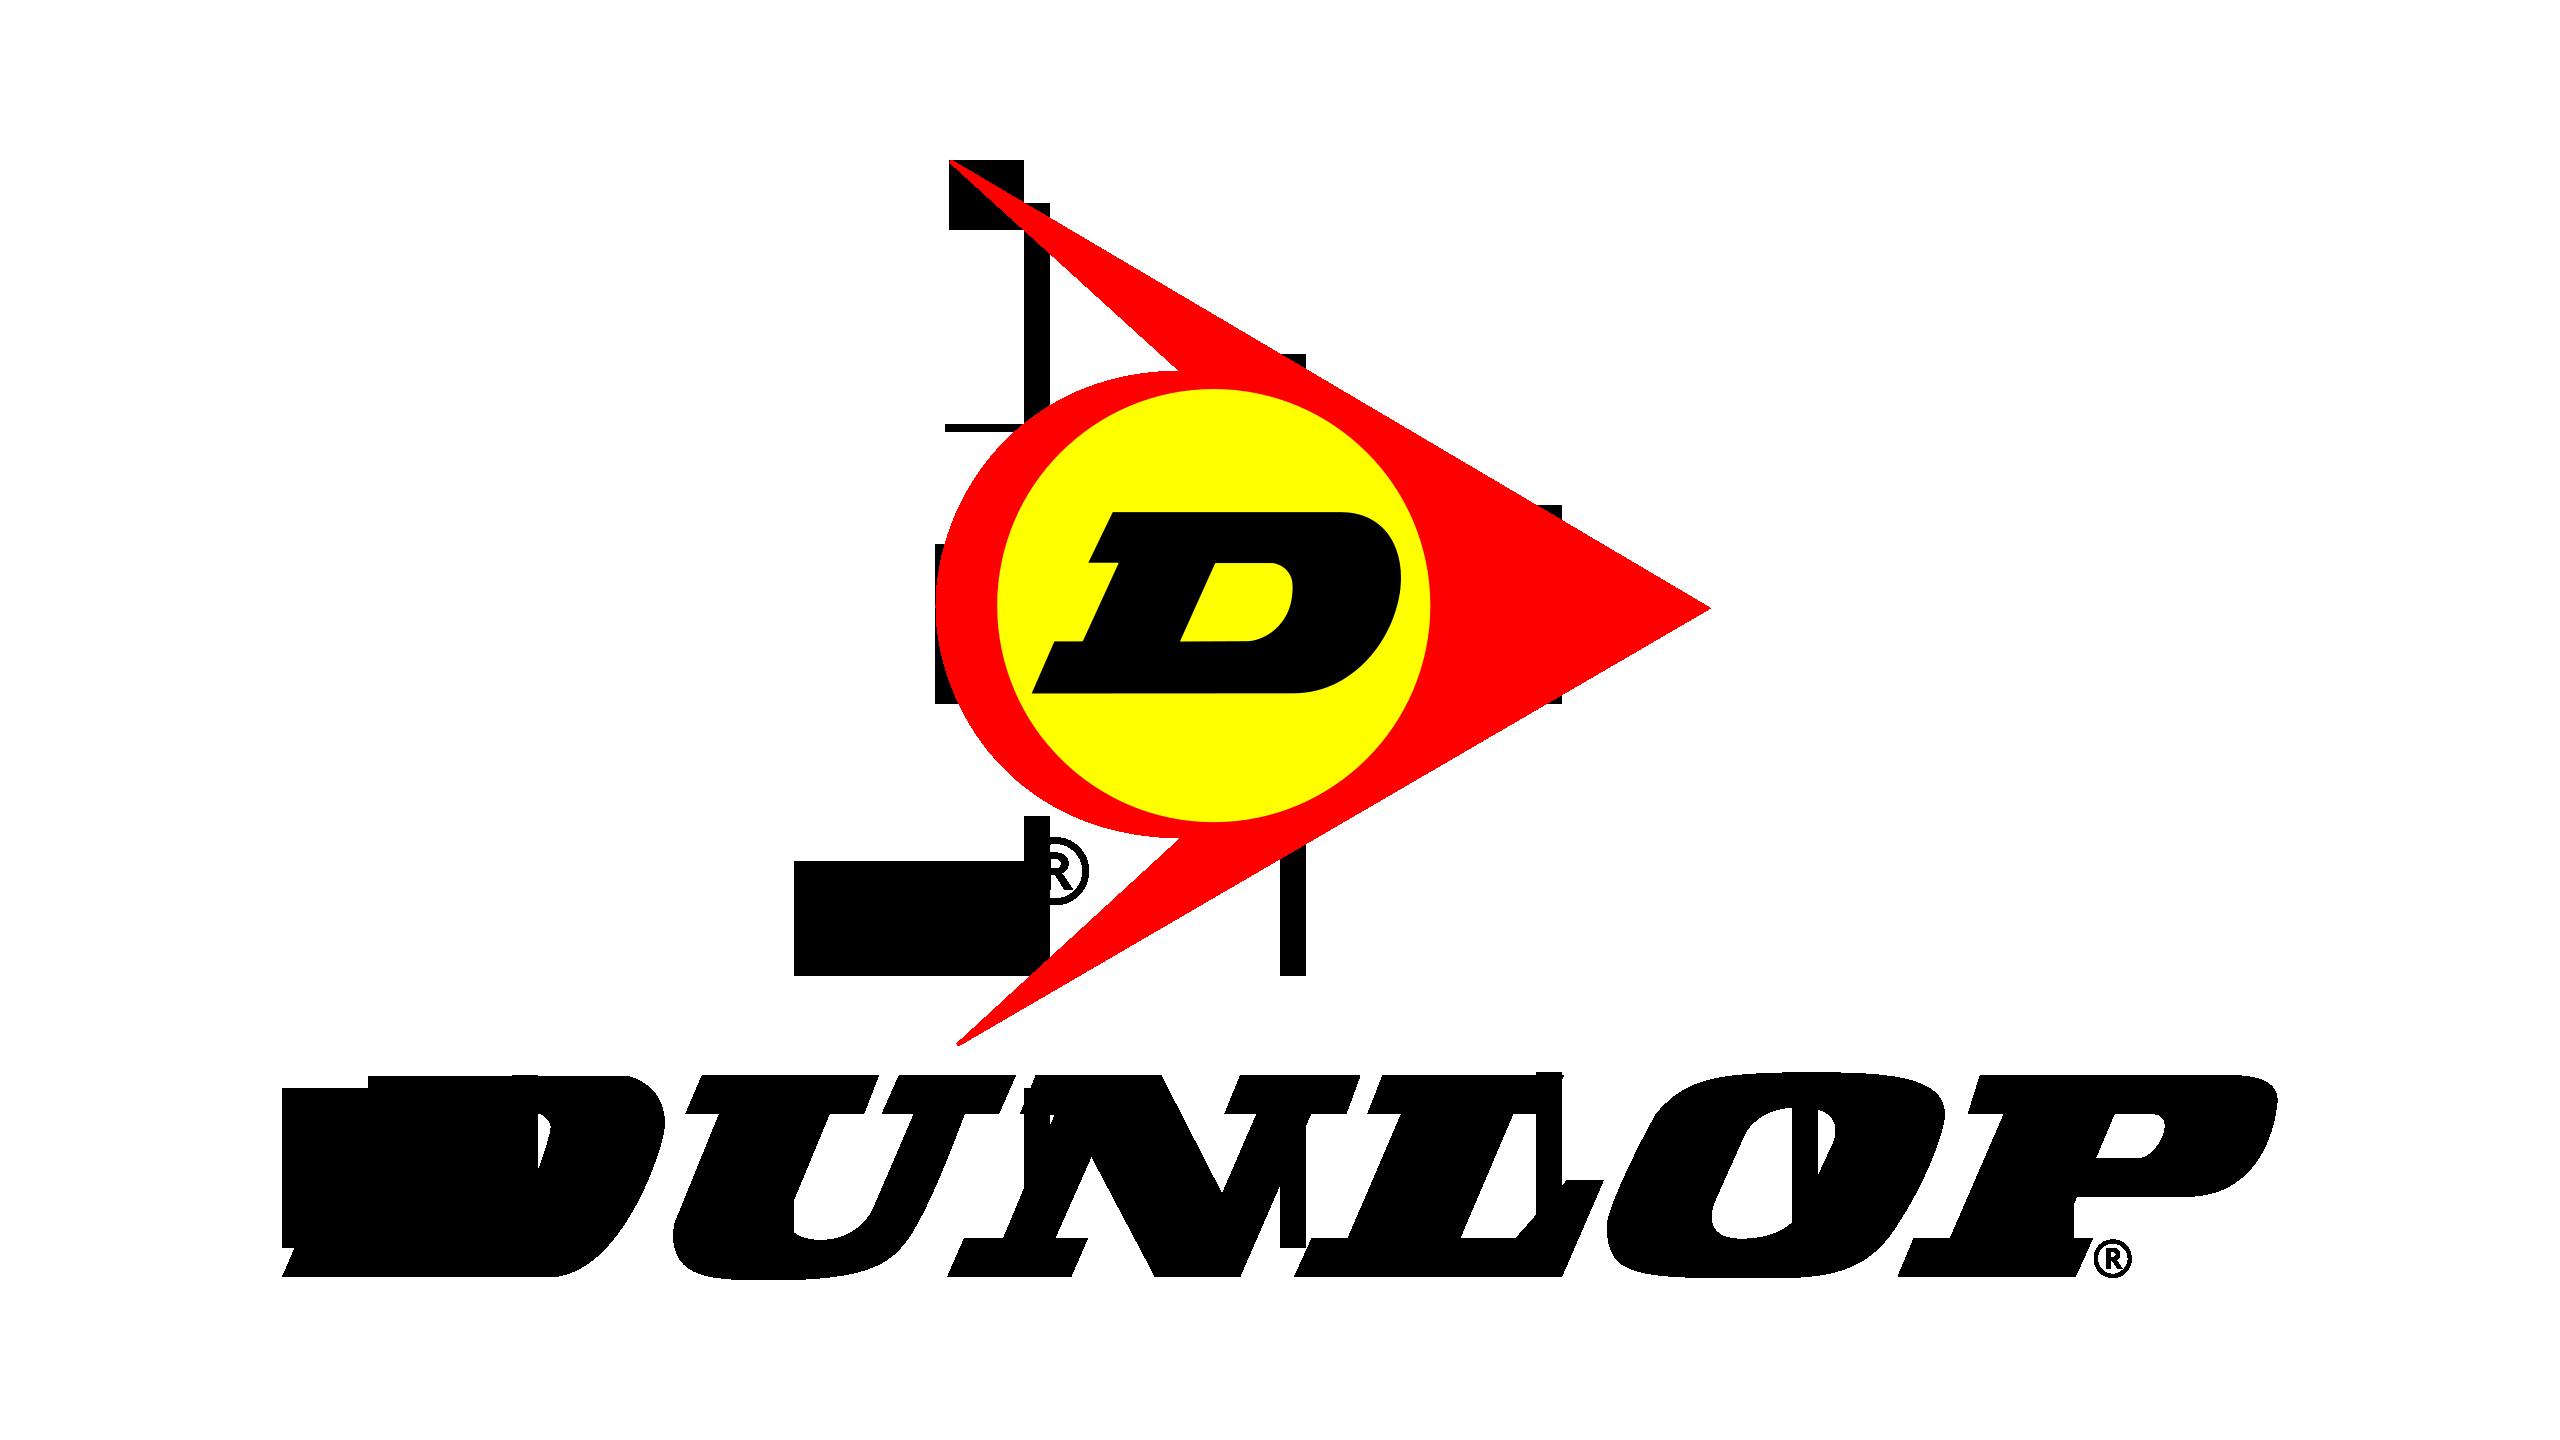 Dunlop PNG - 110425